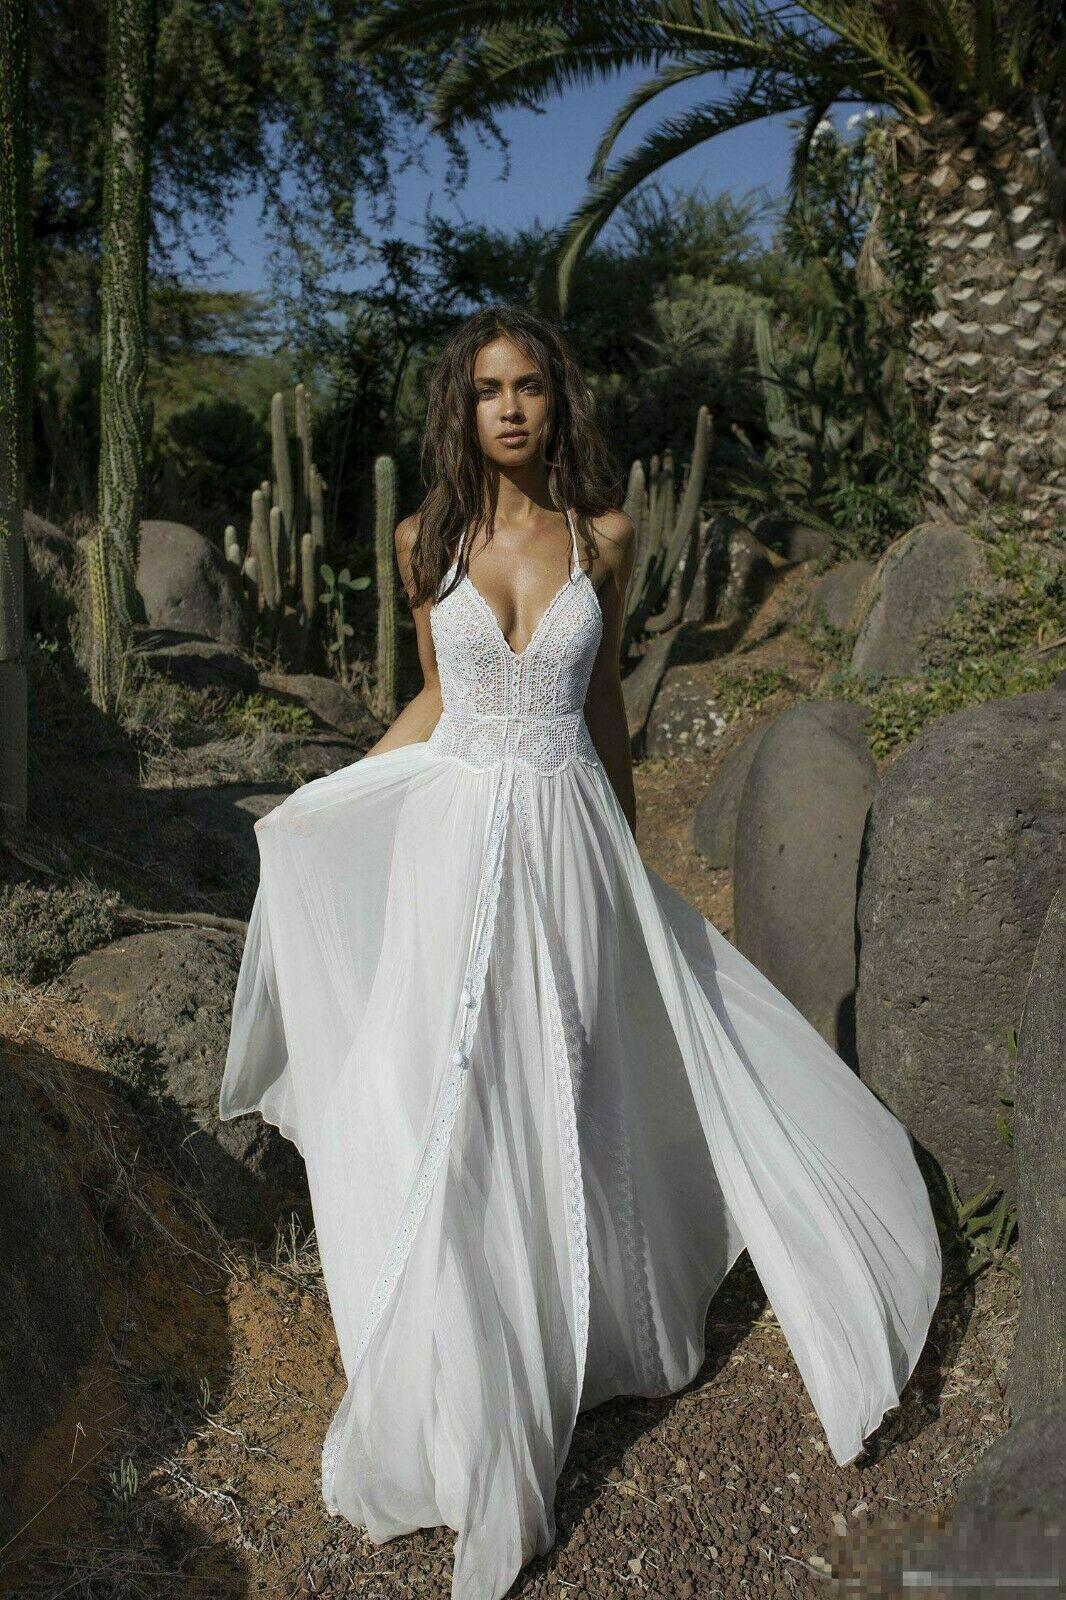 eb1c1bbf919 NEW  250 BHLDN Hitherto Fleur Wedding Dress Sleeveless Gown Rehersal ivory  - Wedding Dresses - Ideas